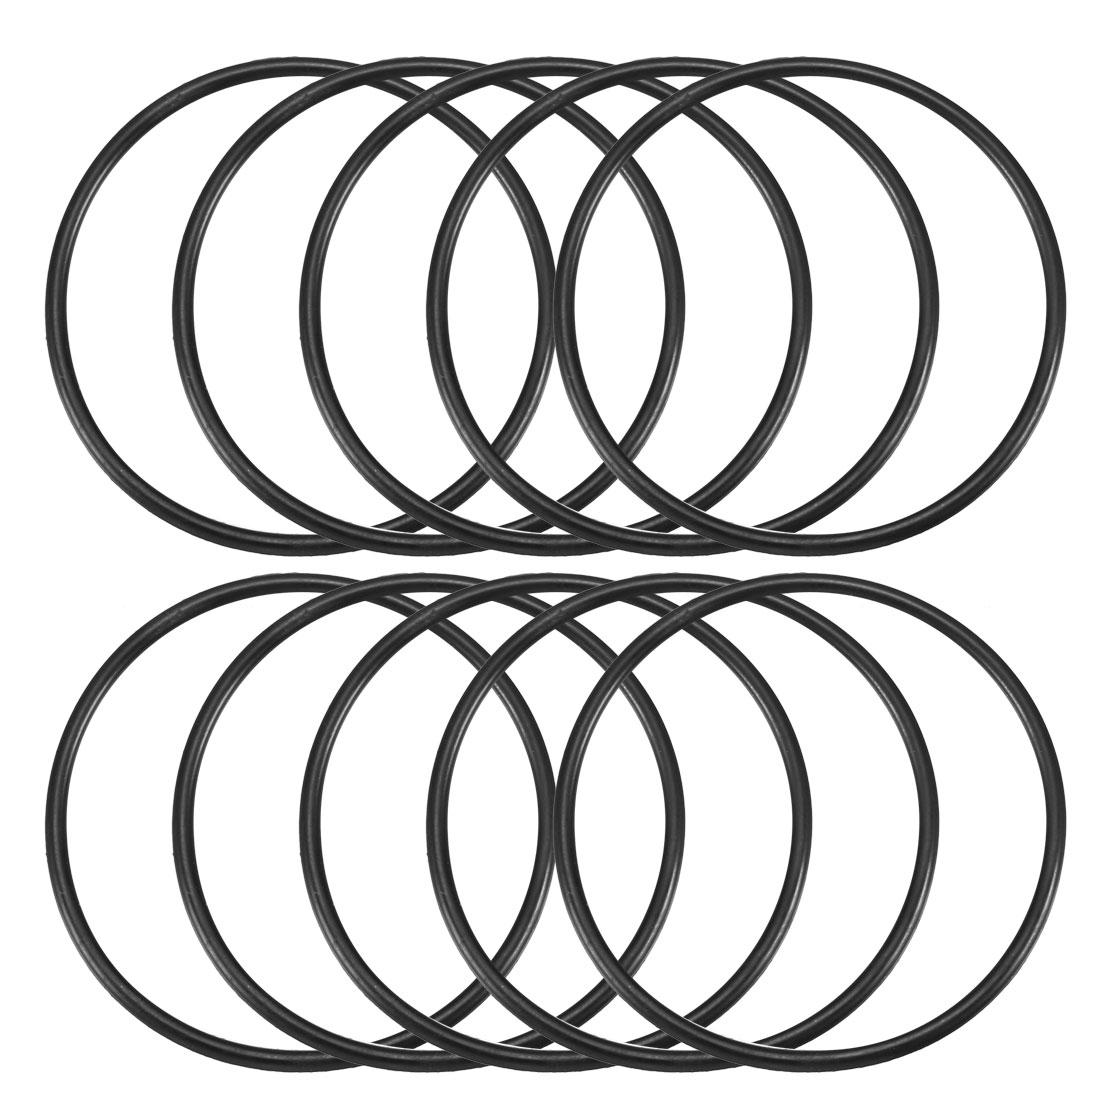 10 Pcs 55mm x 2.5mm x 50mm Mechanical Black NBR O Rings Oil Seal Washers